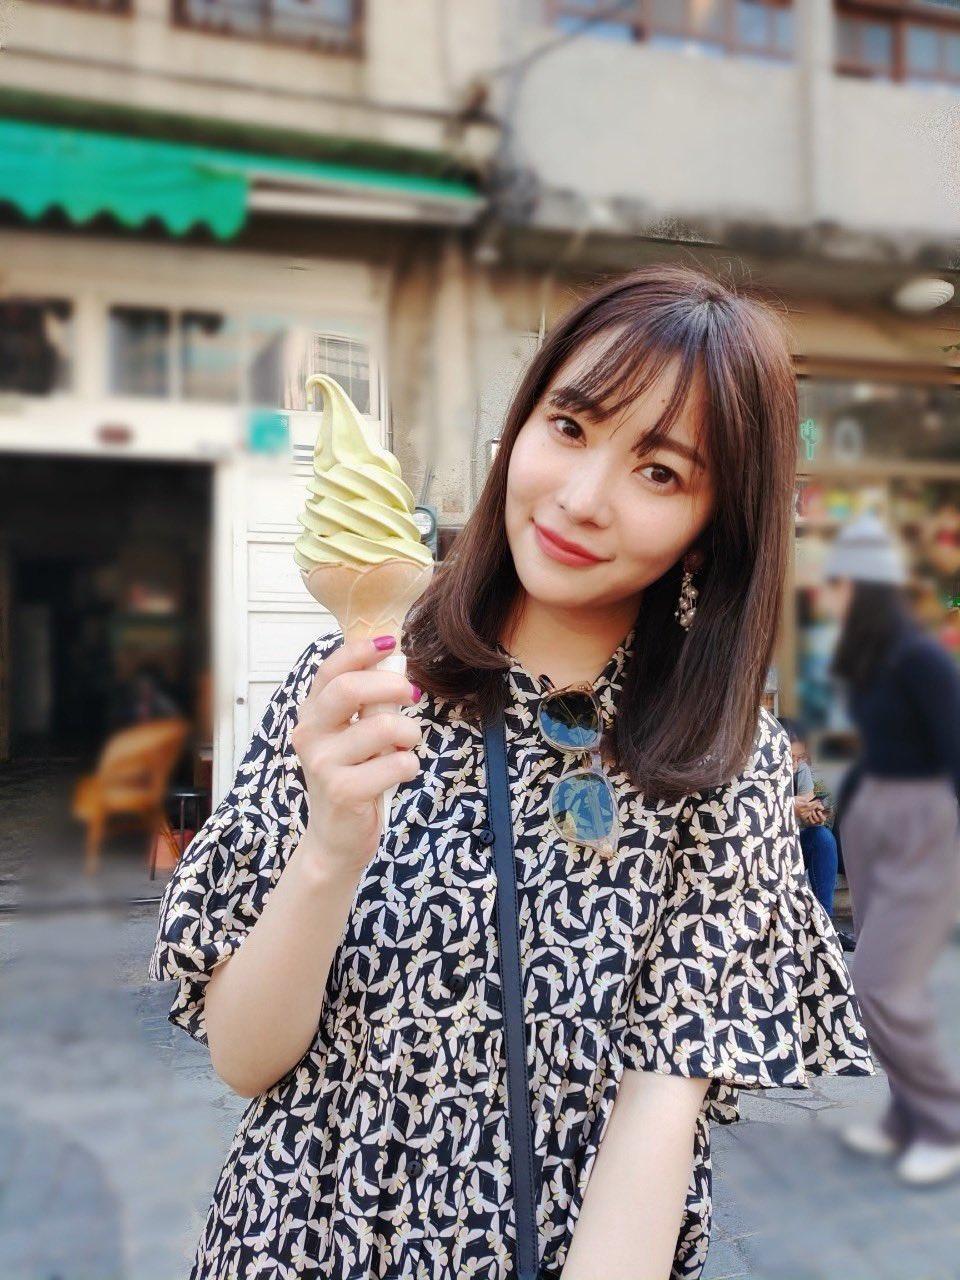 【HKT卒業生】さっしーこと指原莉乃 実況スレ☆439